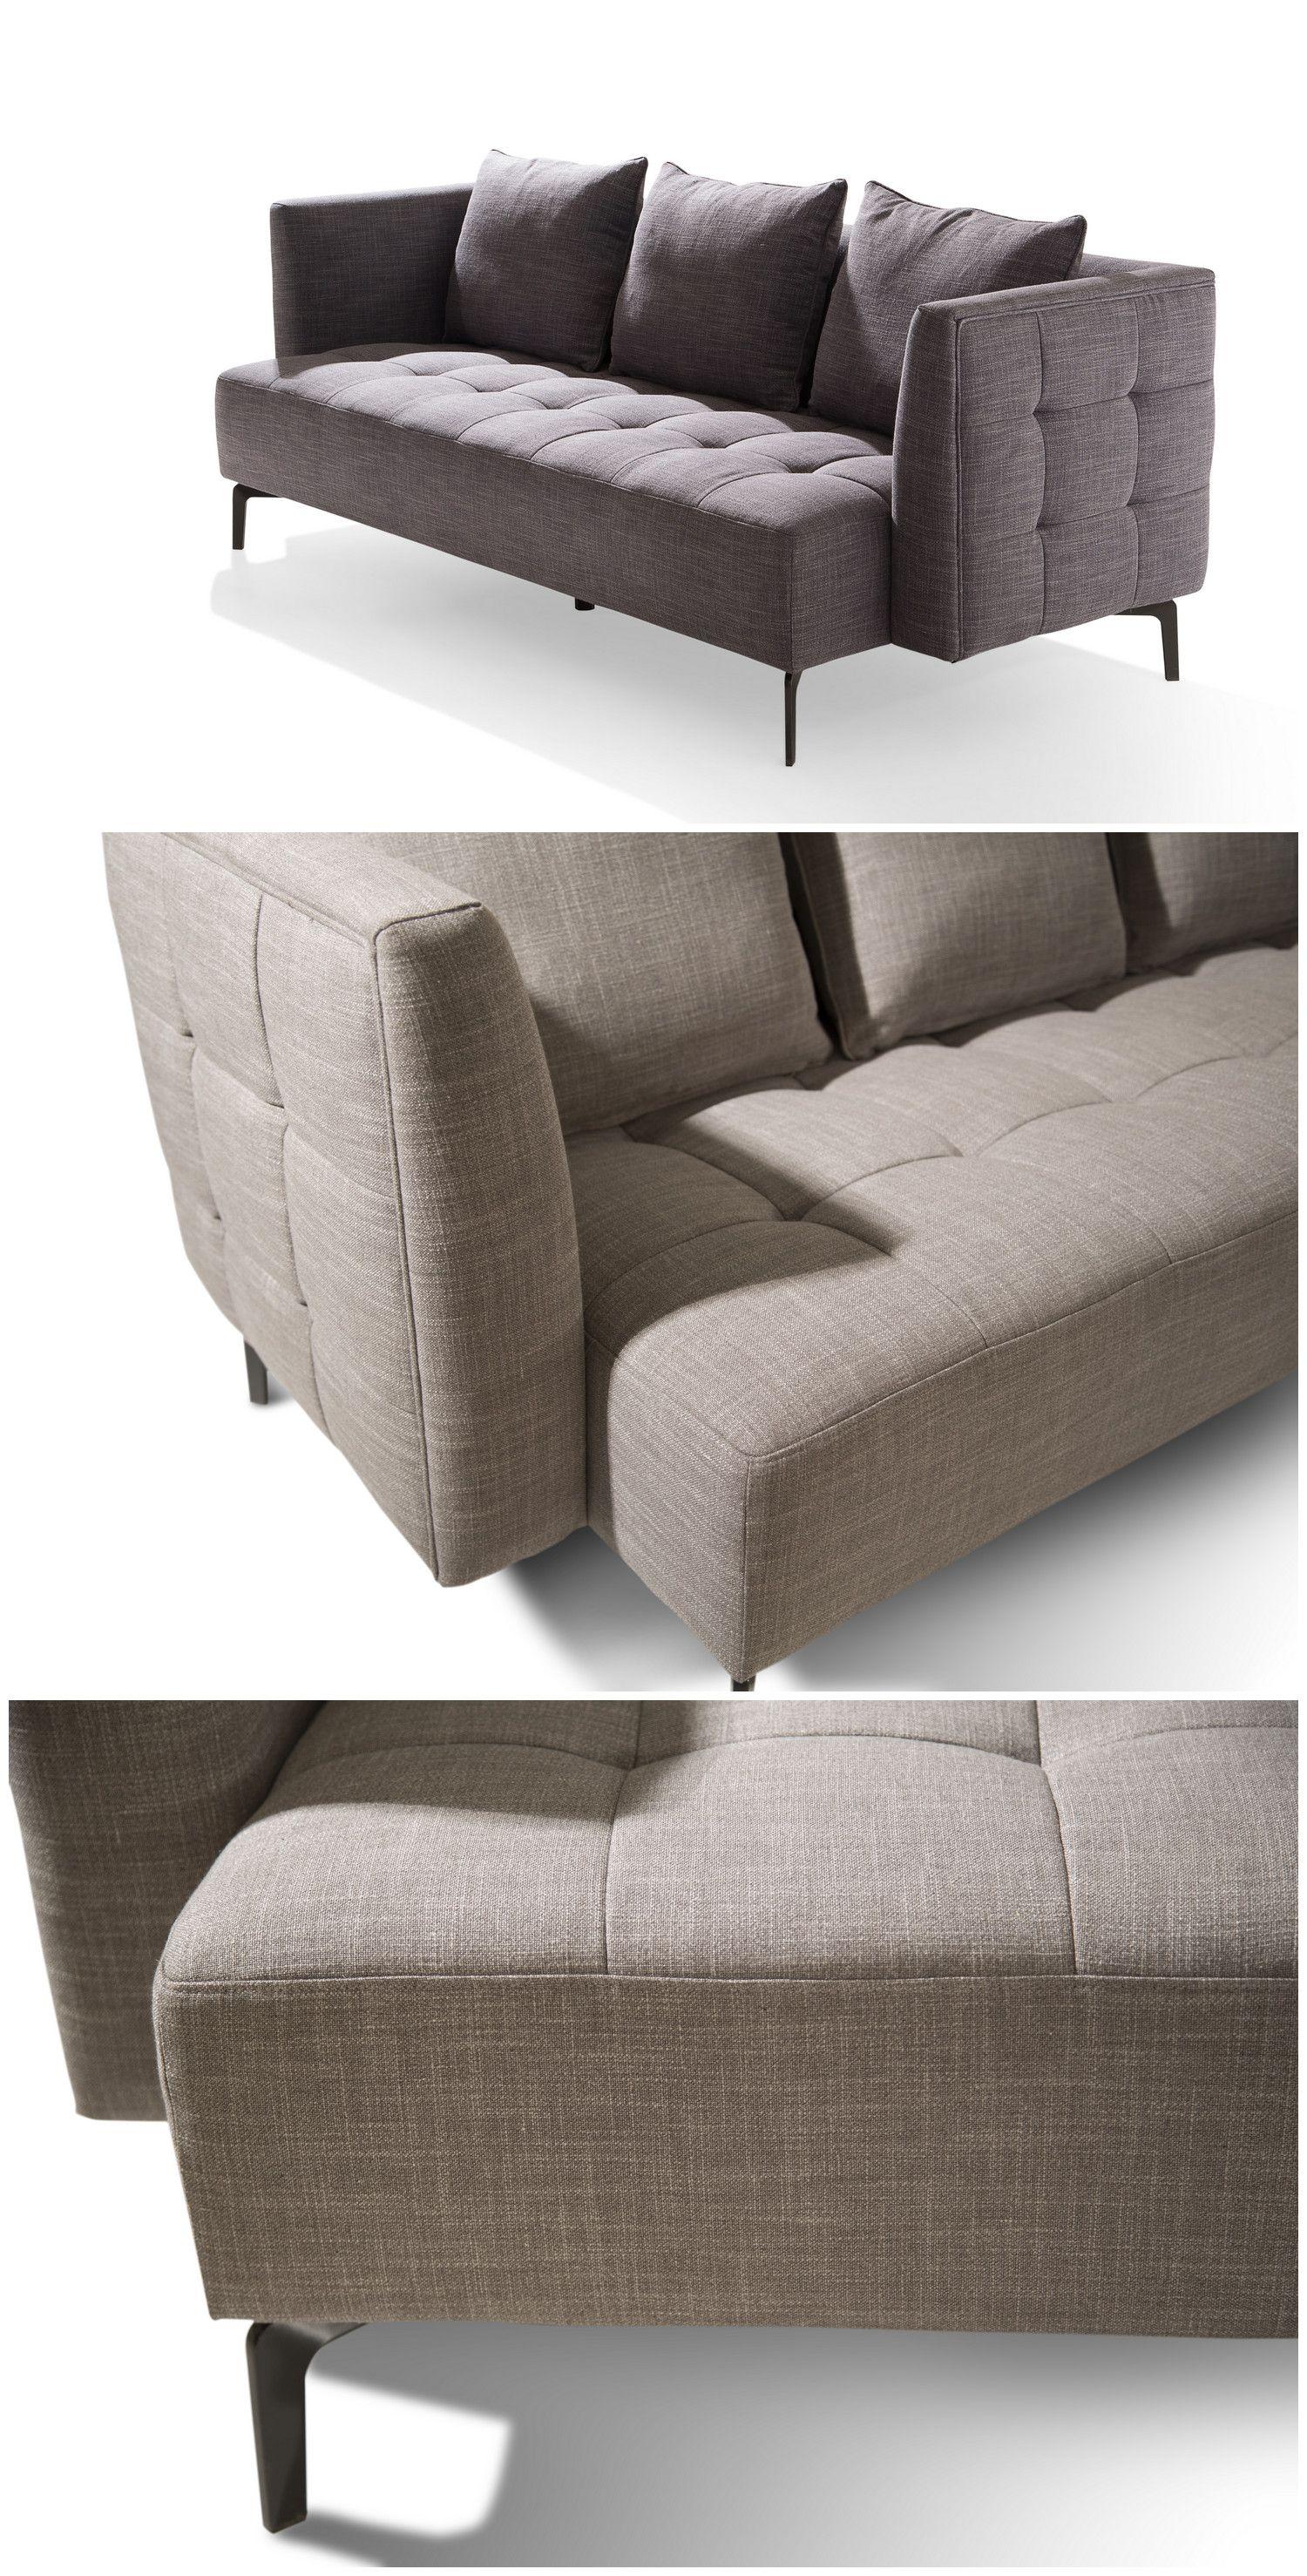 Sofa China Supplier Metal Legs Tufted Box Simple Sofa Set Modern Sofa Living Room Simple Sofa Modern Sofa Set